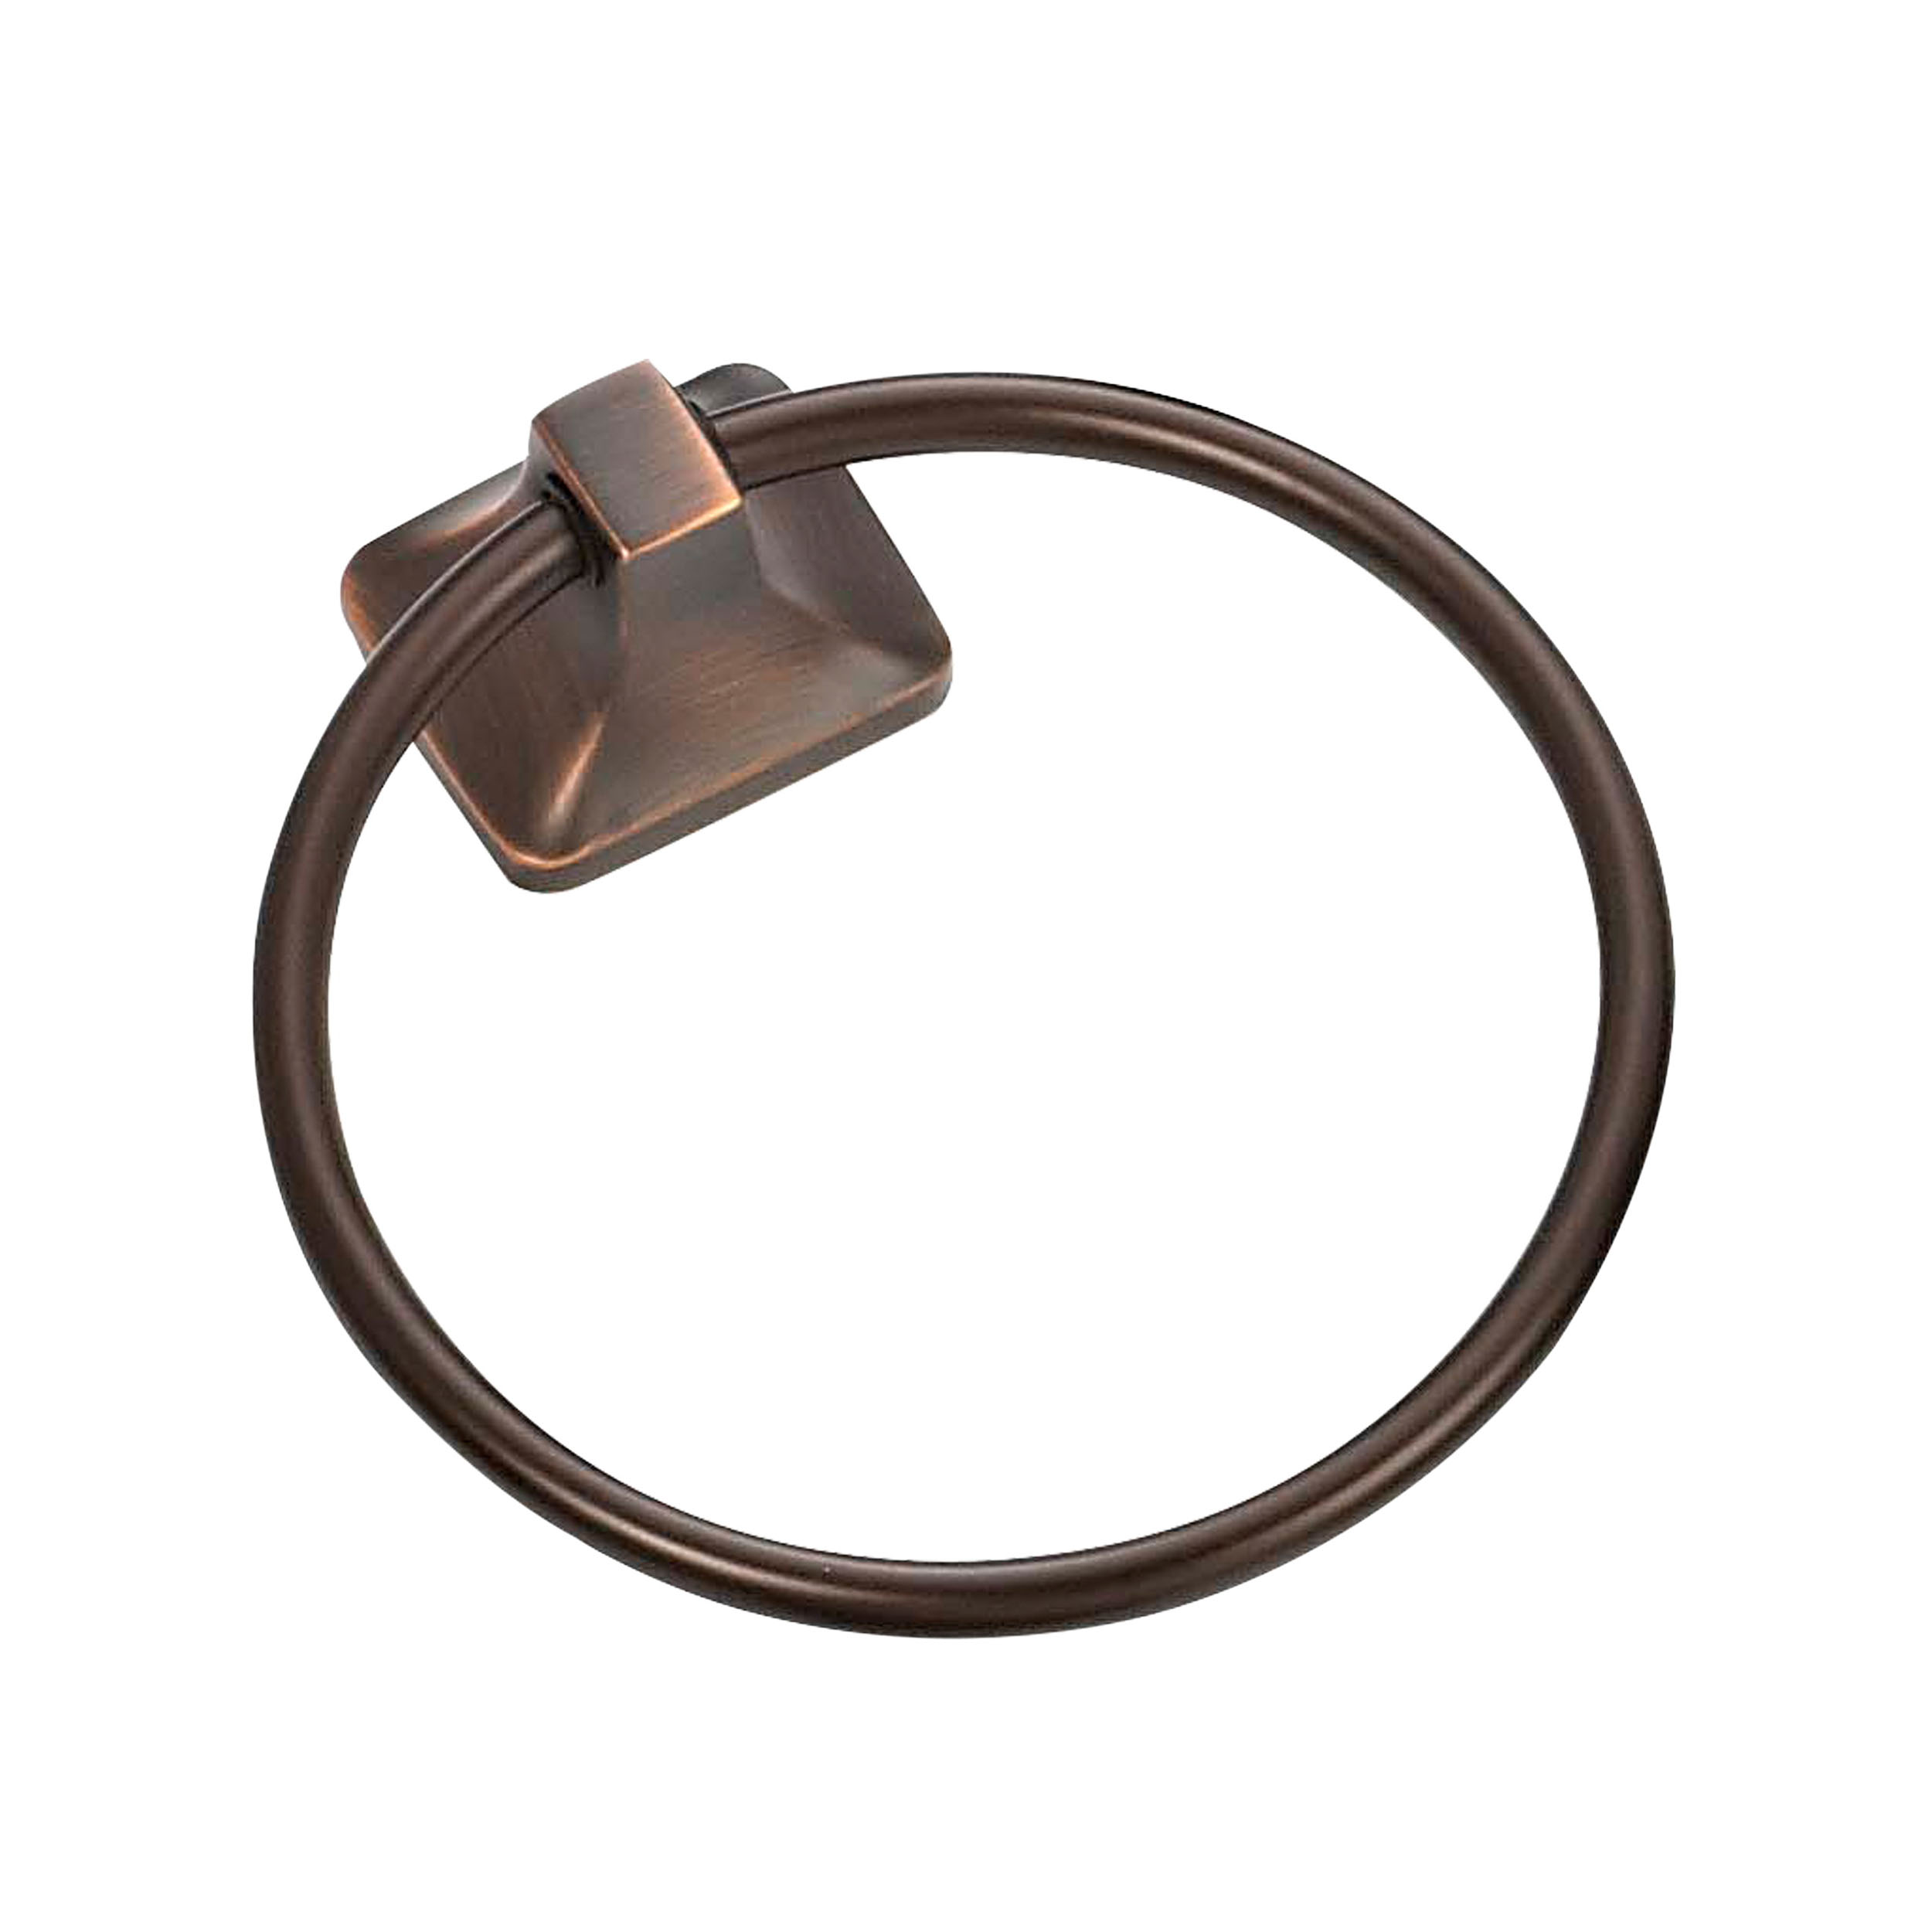 Mintcraft 3660-07-SOU Towel Ring Brushed Nickel